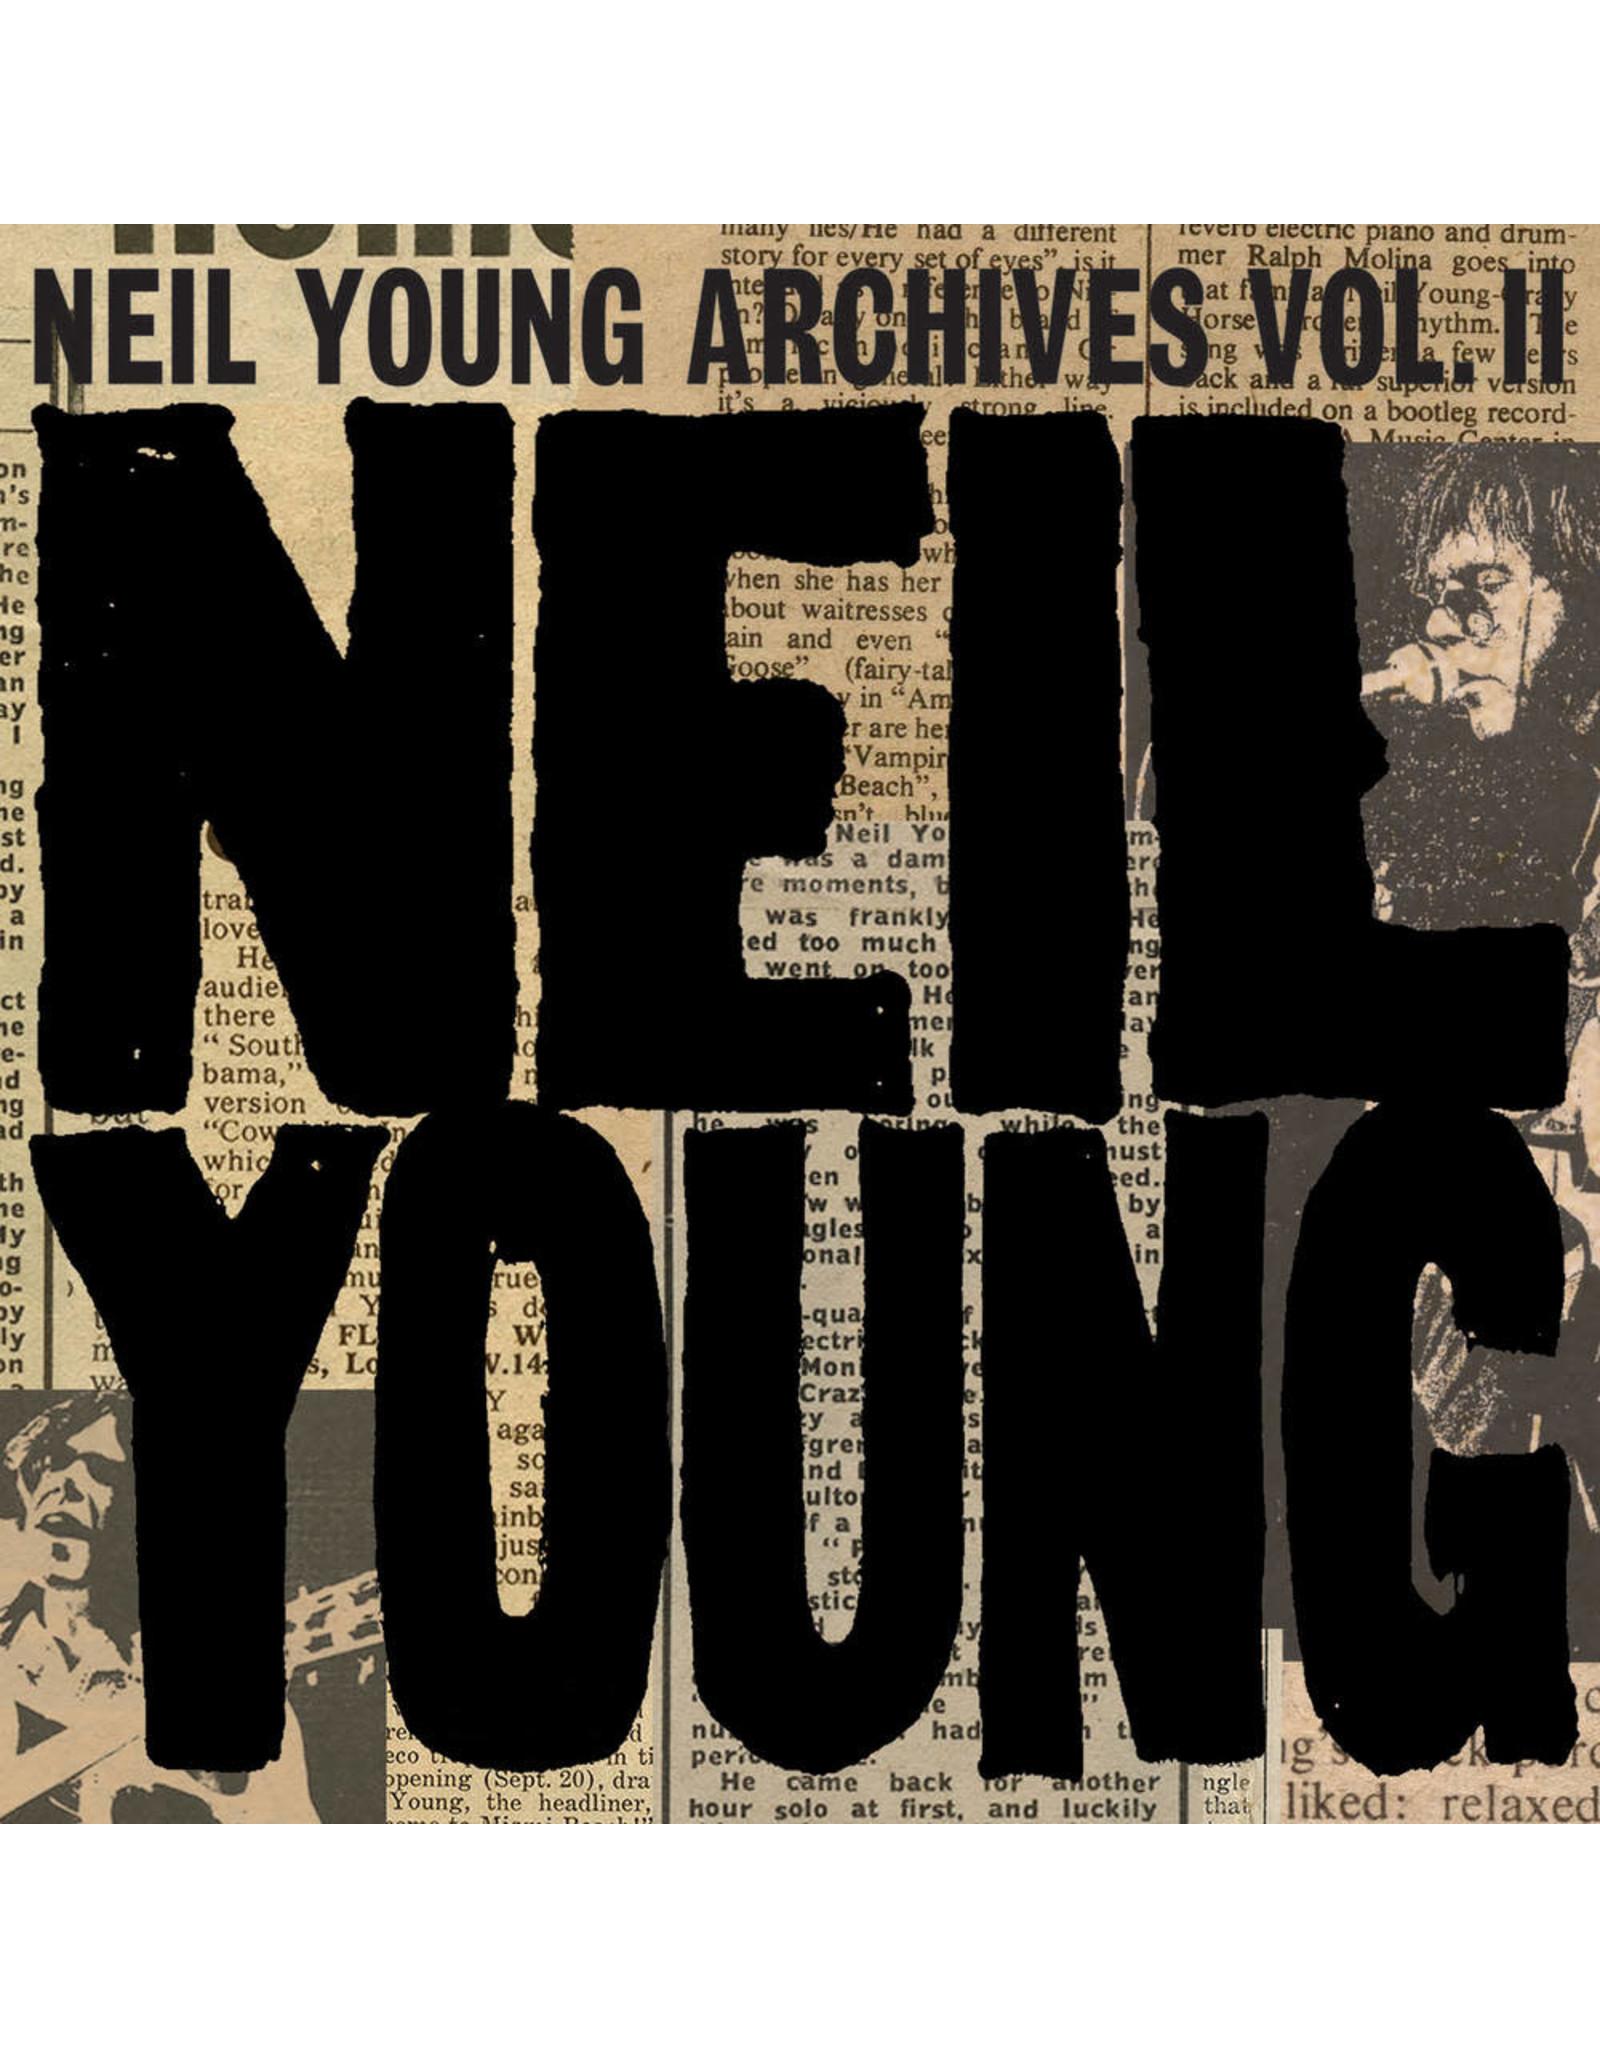 Young, Neil - Archives Vol. II (Boxset) CD